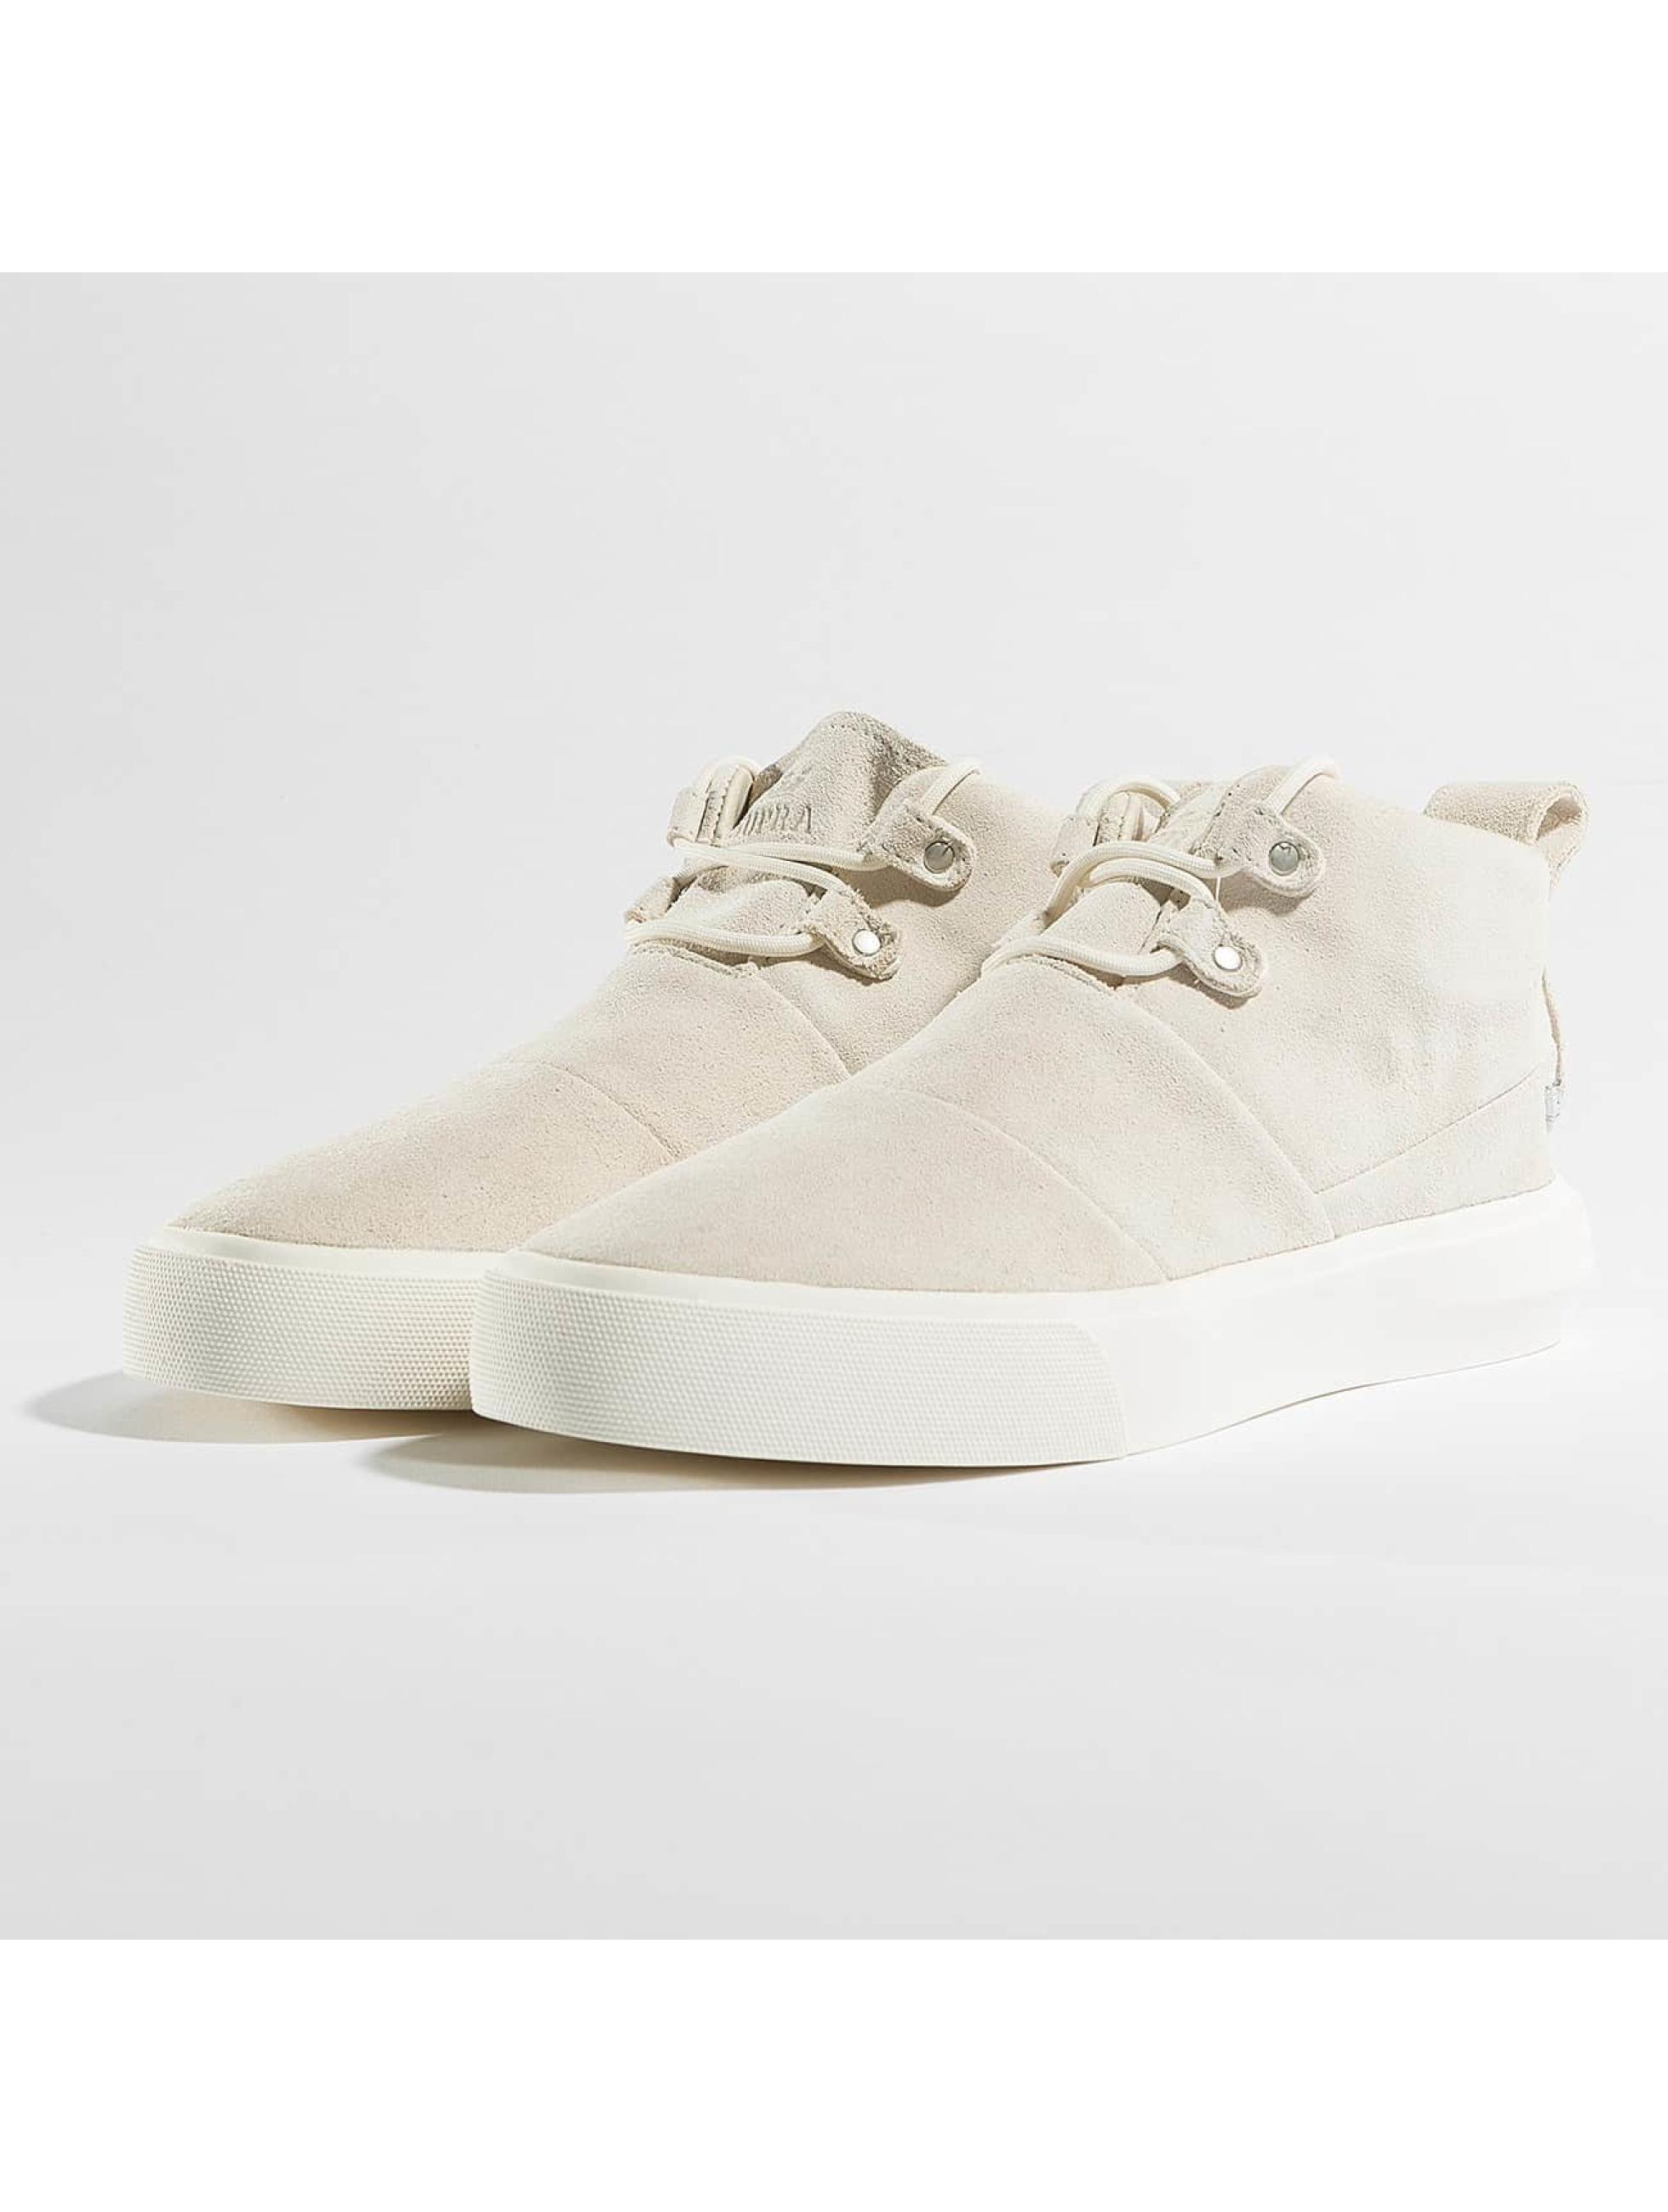 Supra Sneakers Charles white